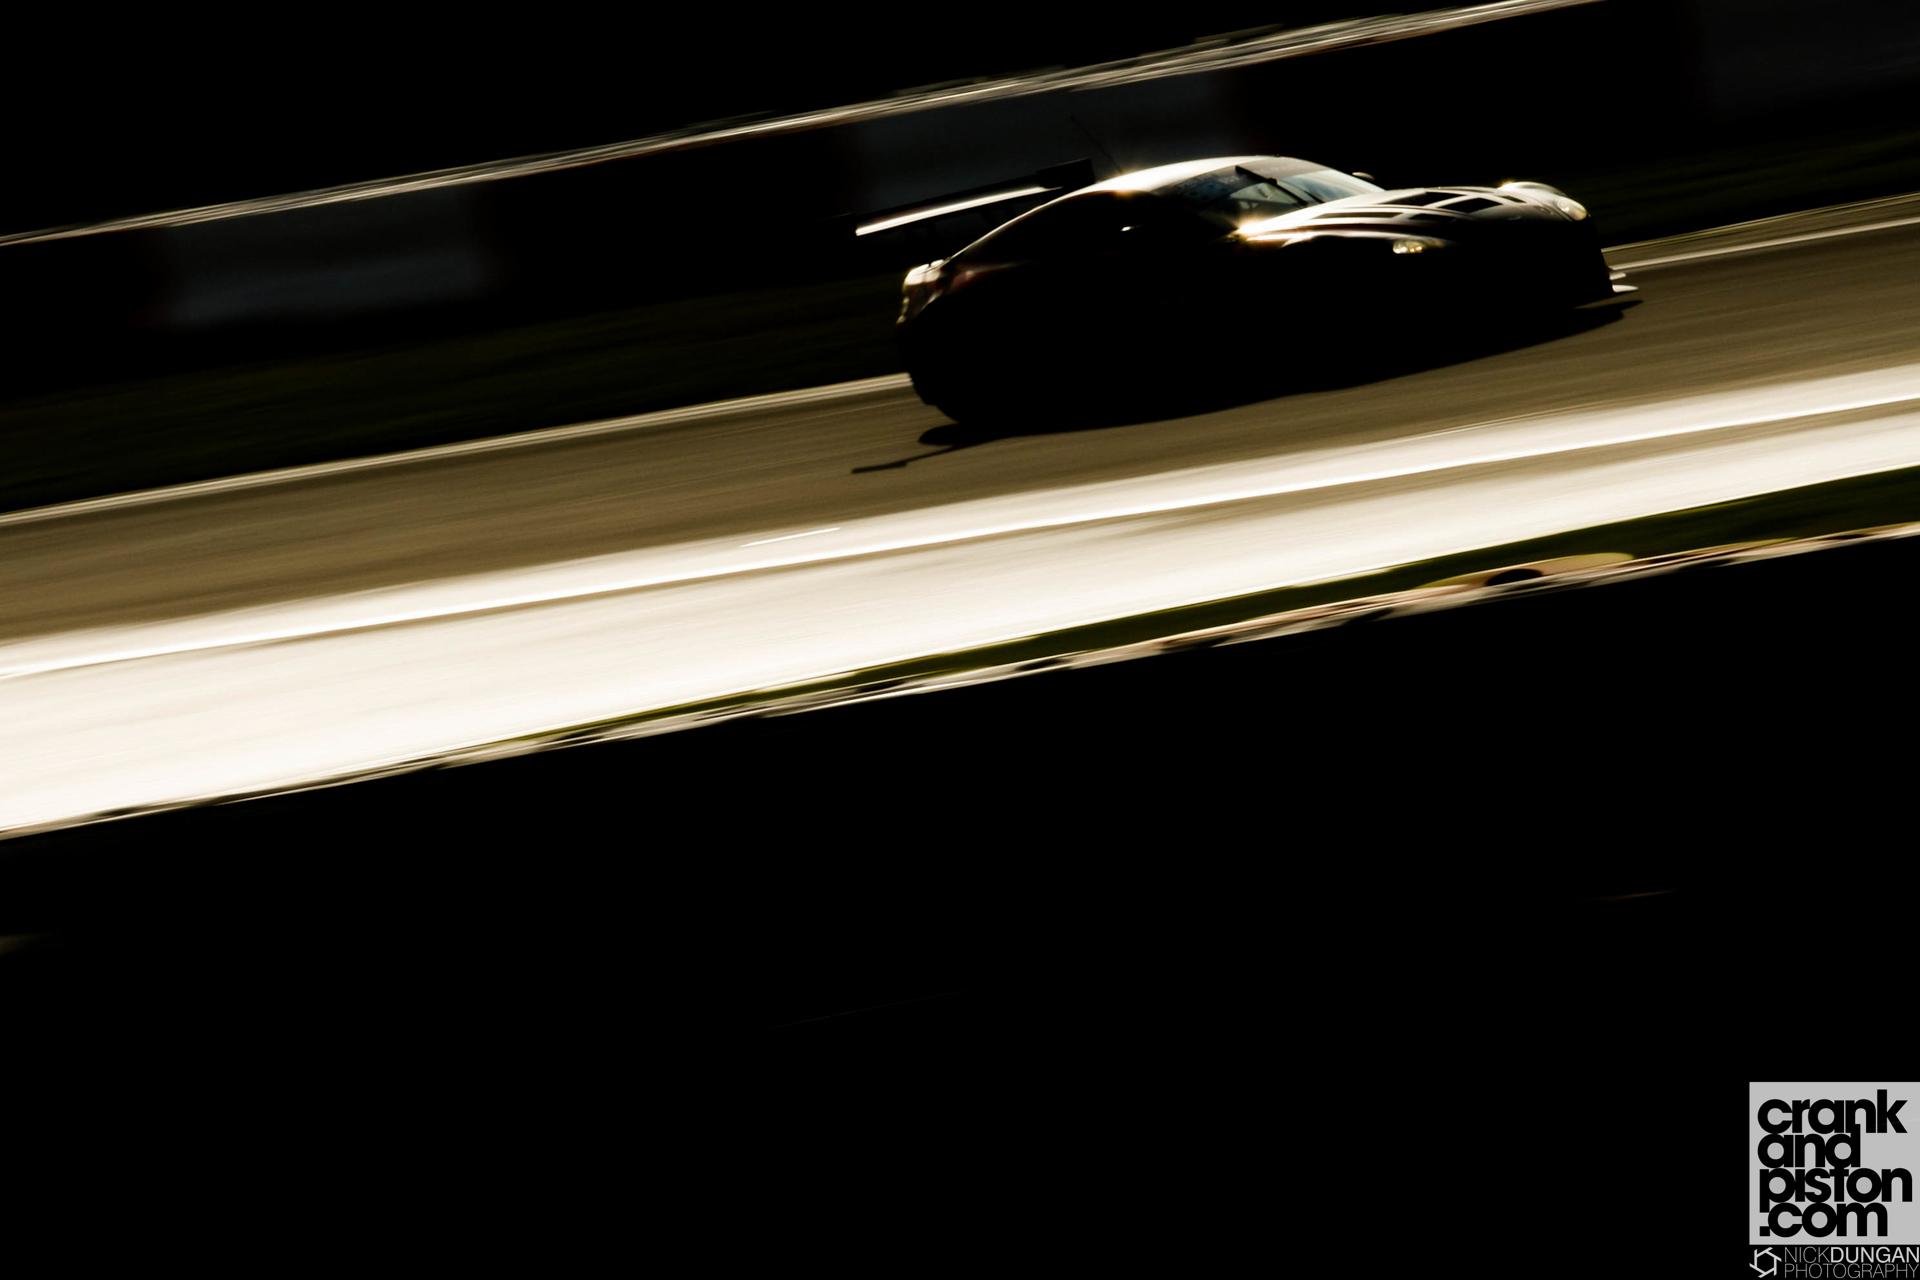 Richard Abra, Mark Poole, Joe Osborne|MP Motorsport AMR|Aston Martin Vantage GT3 - Blancpain i-Racing N¸rburgring 1000 at N¸rburgring -  - Germany